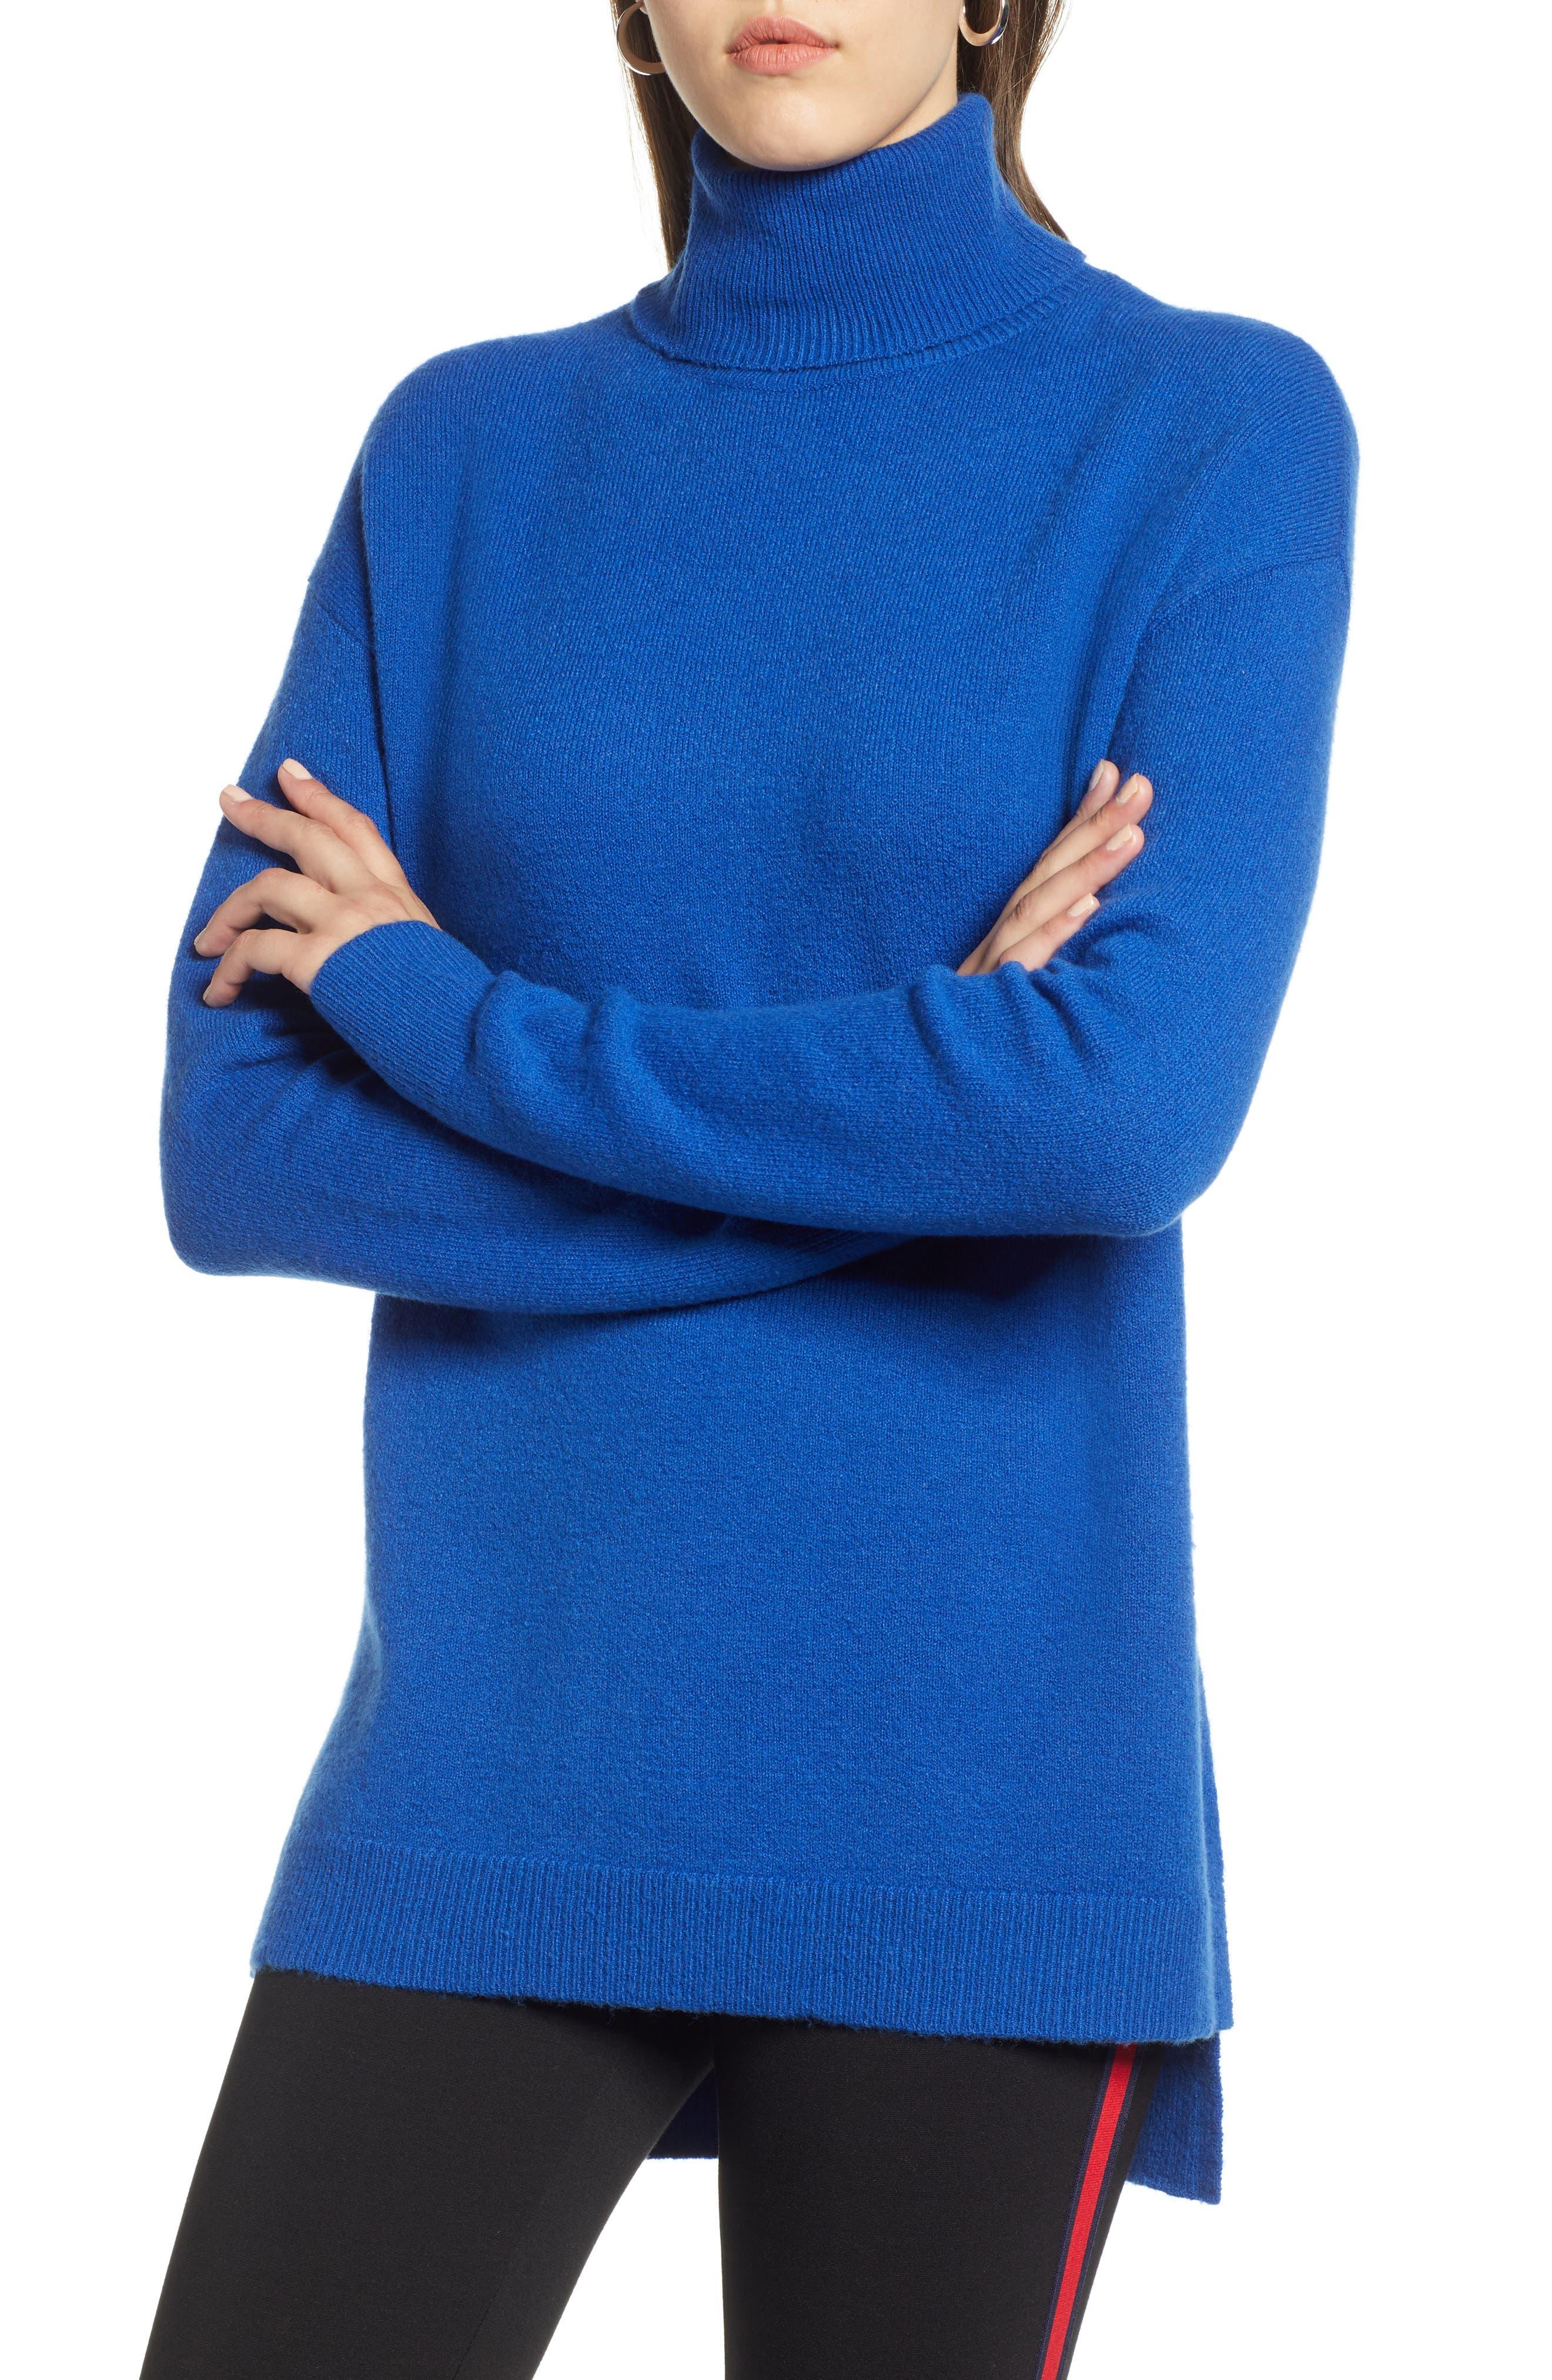 Turtleneck Wool Blend Tunic Sweater,                             Main thumbnail 1, color,                             BLUE MAZARINE